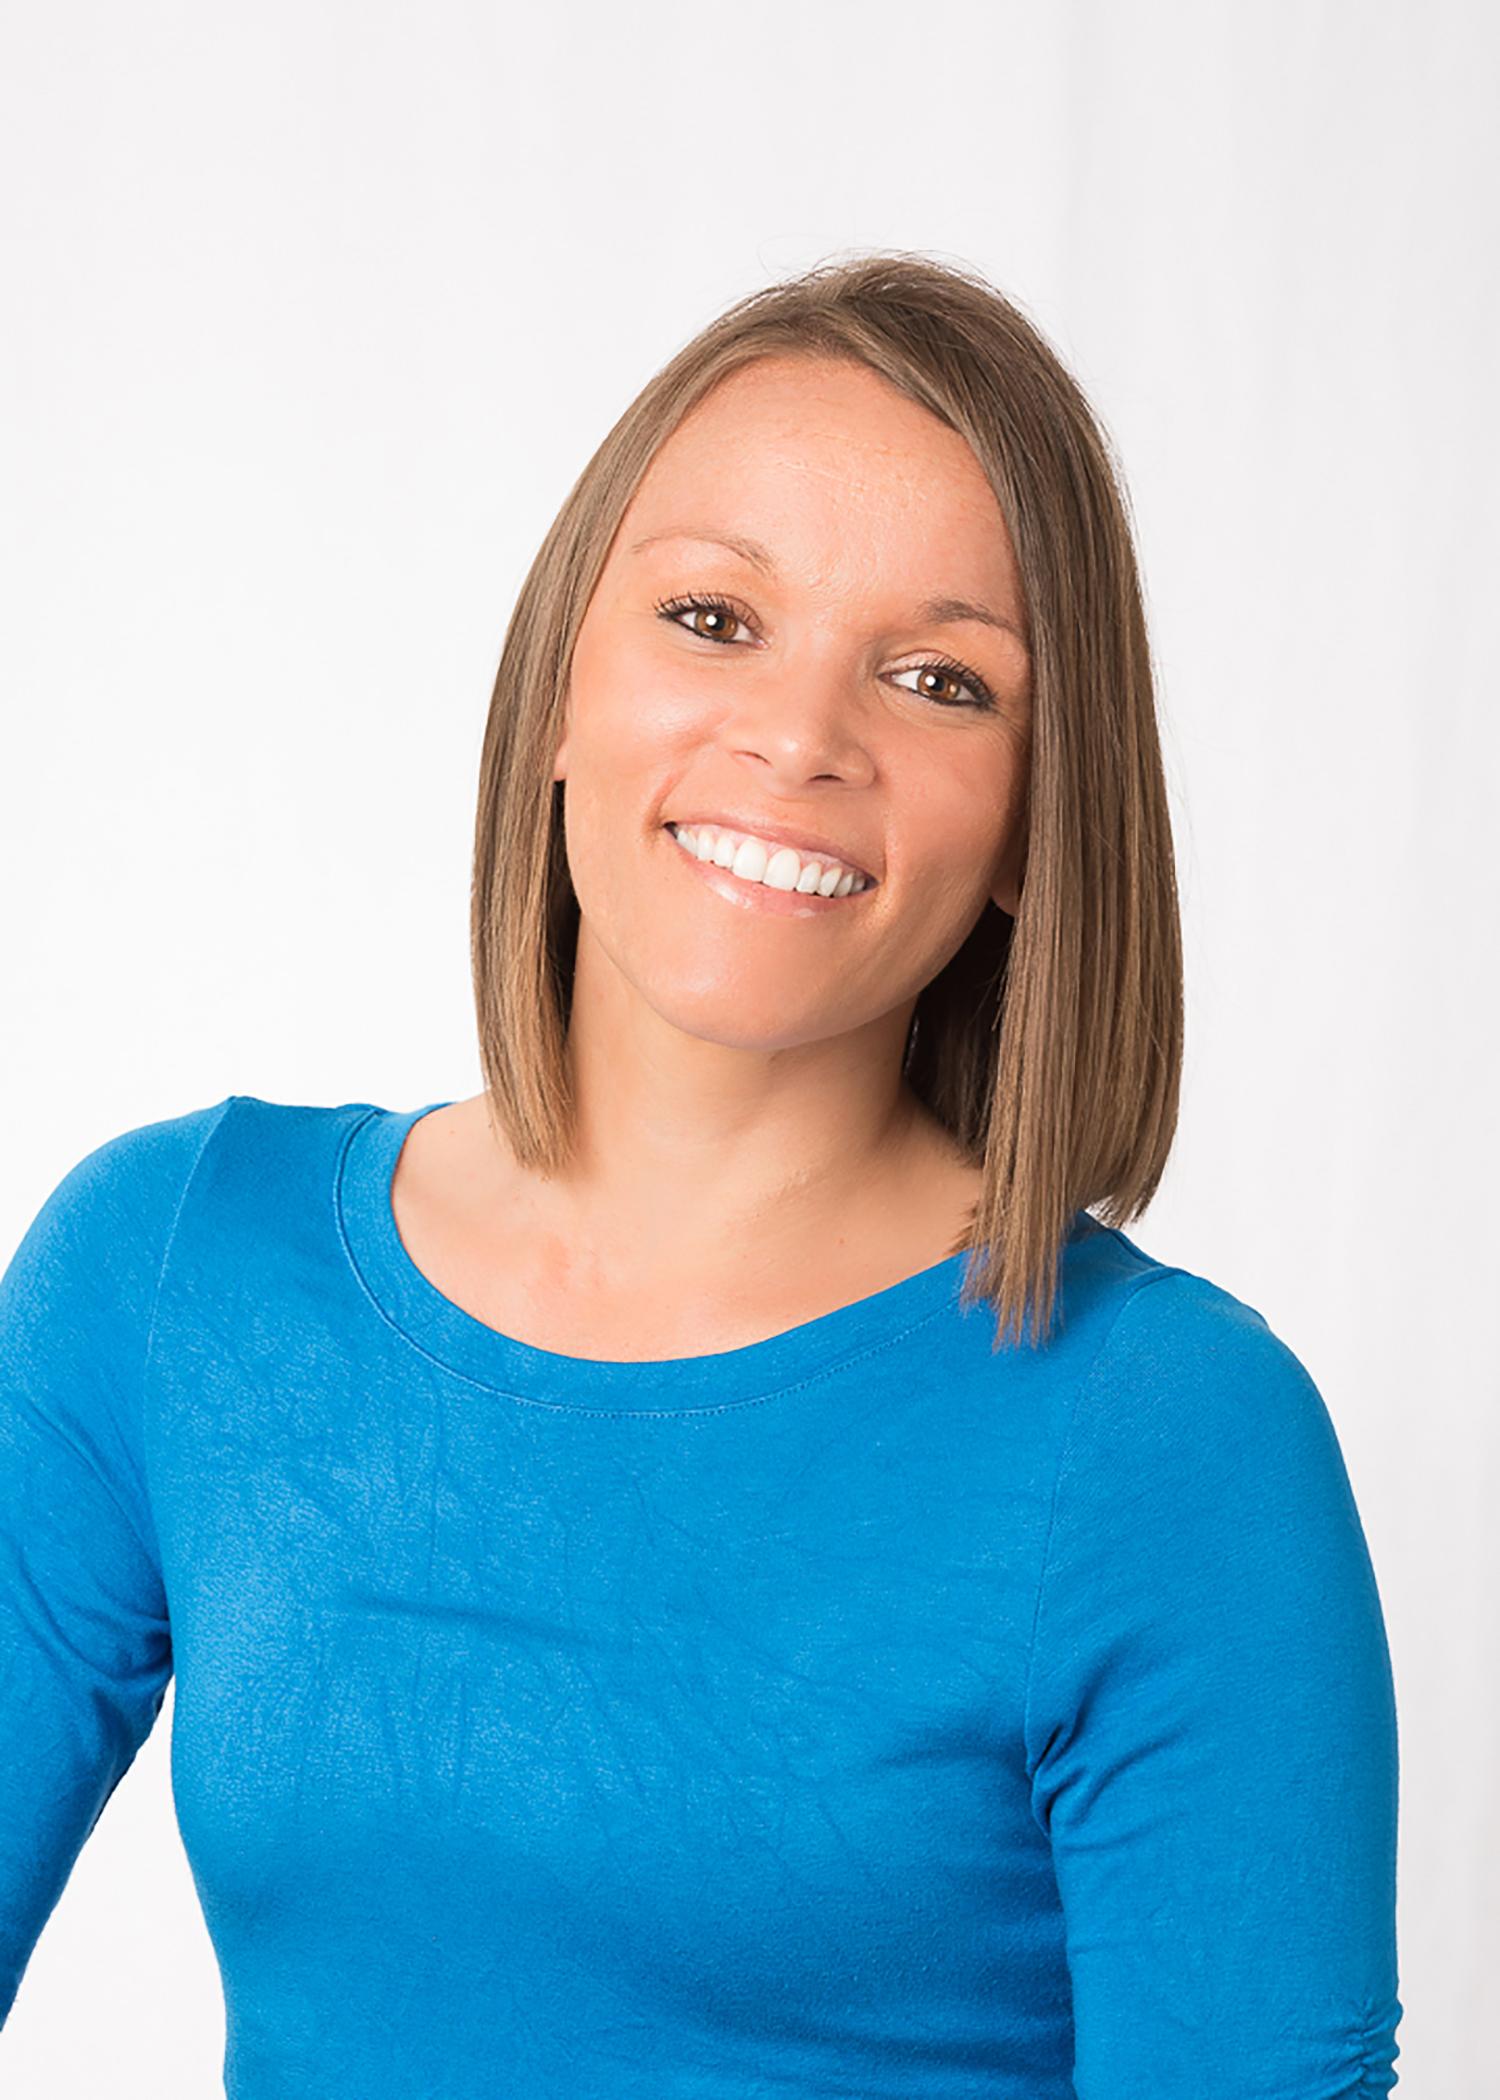 Heather - Microcopy-1184.jpg